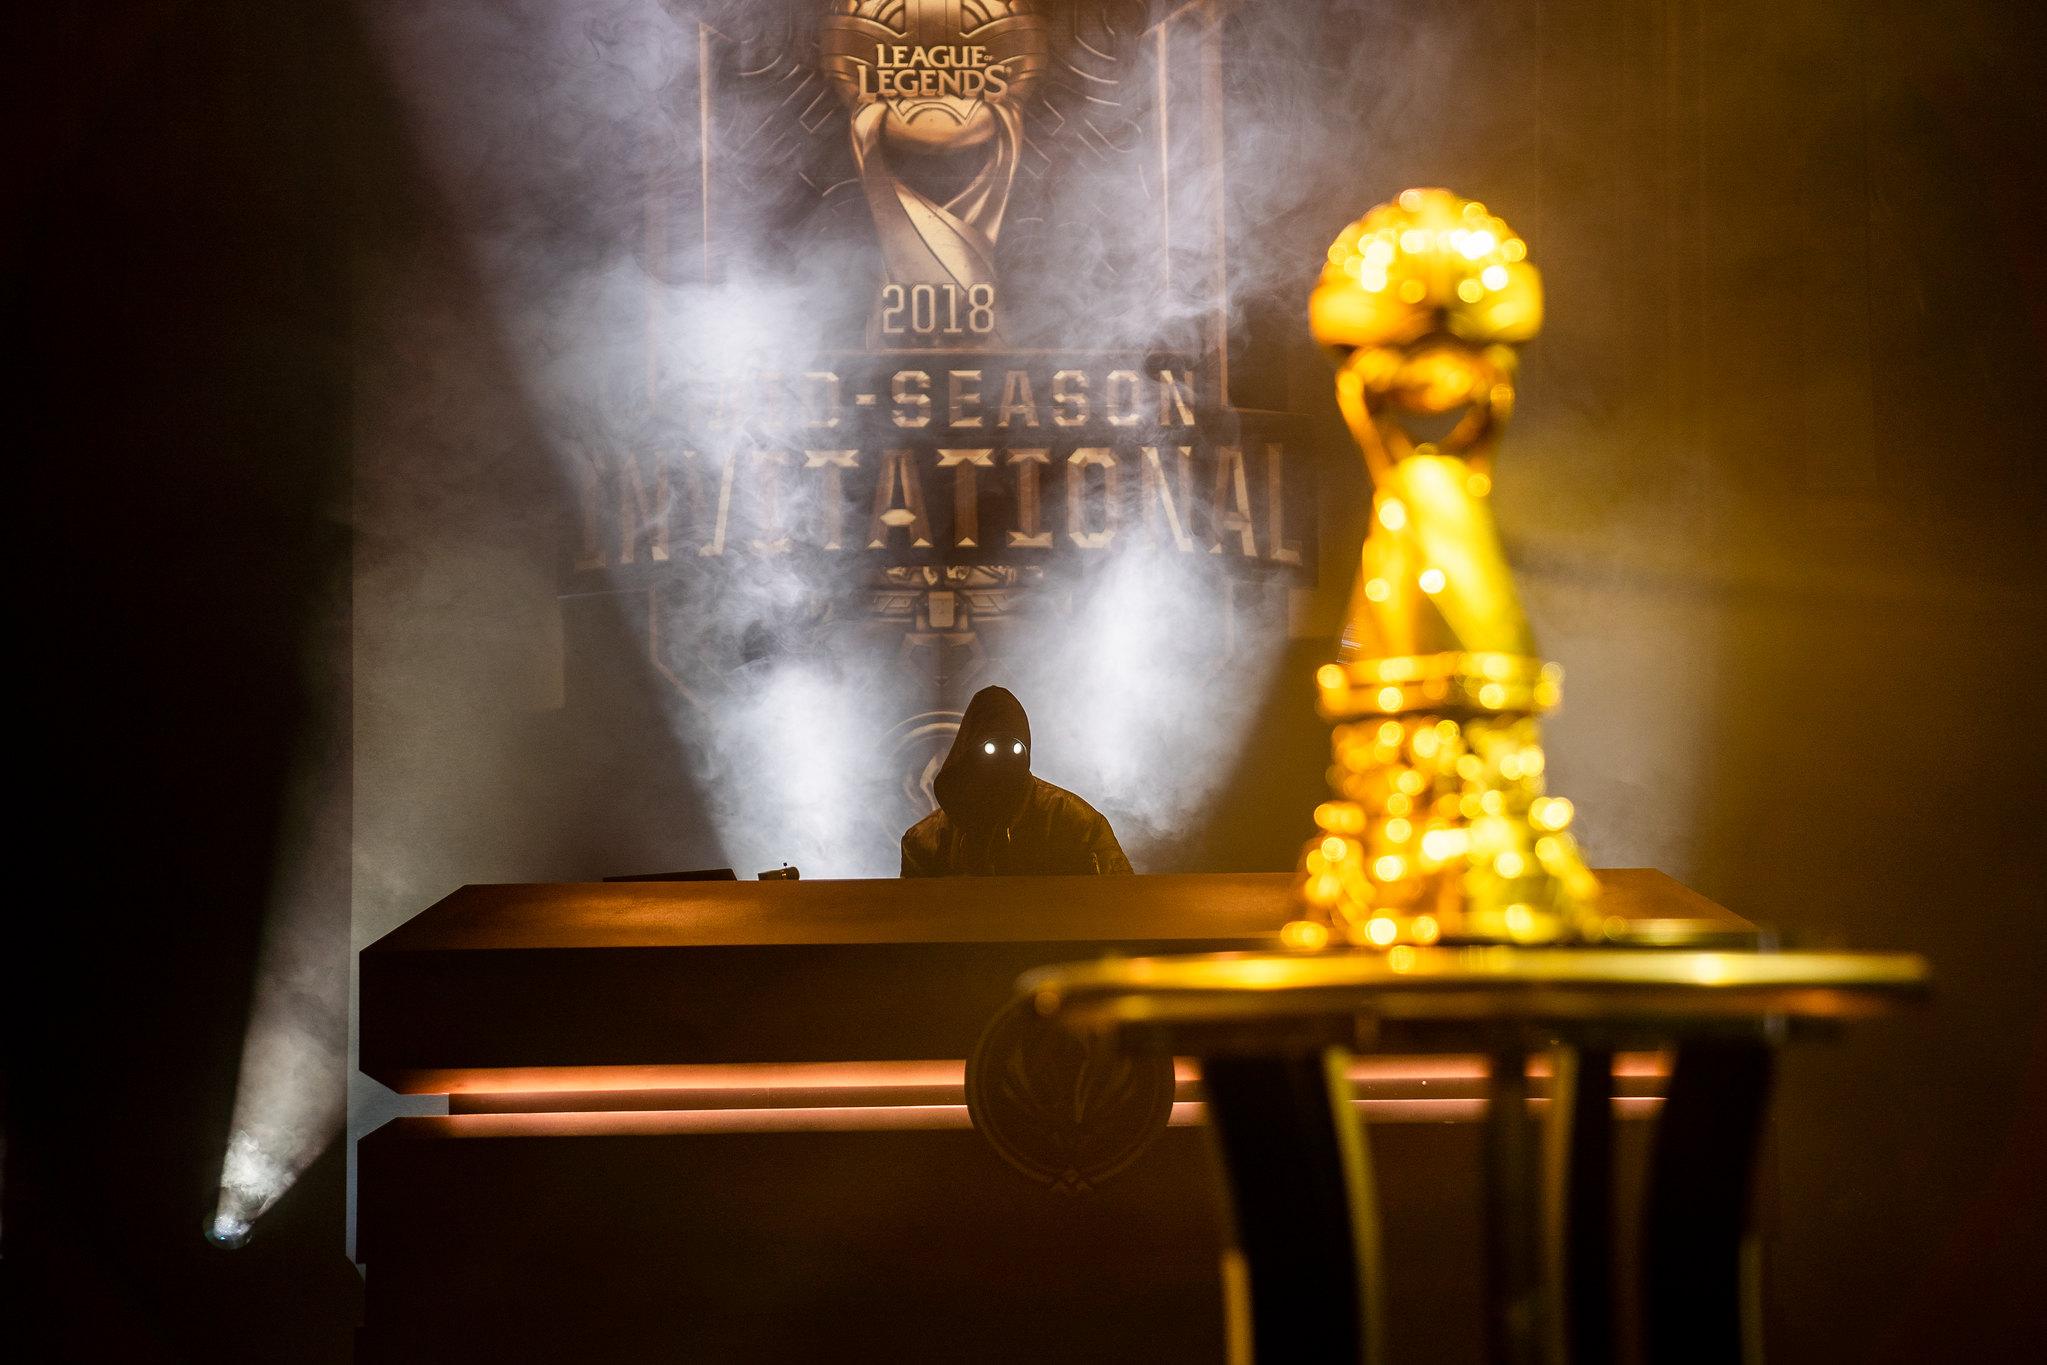 msi league of legends 2018 teams